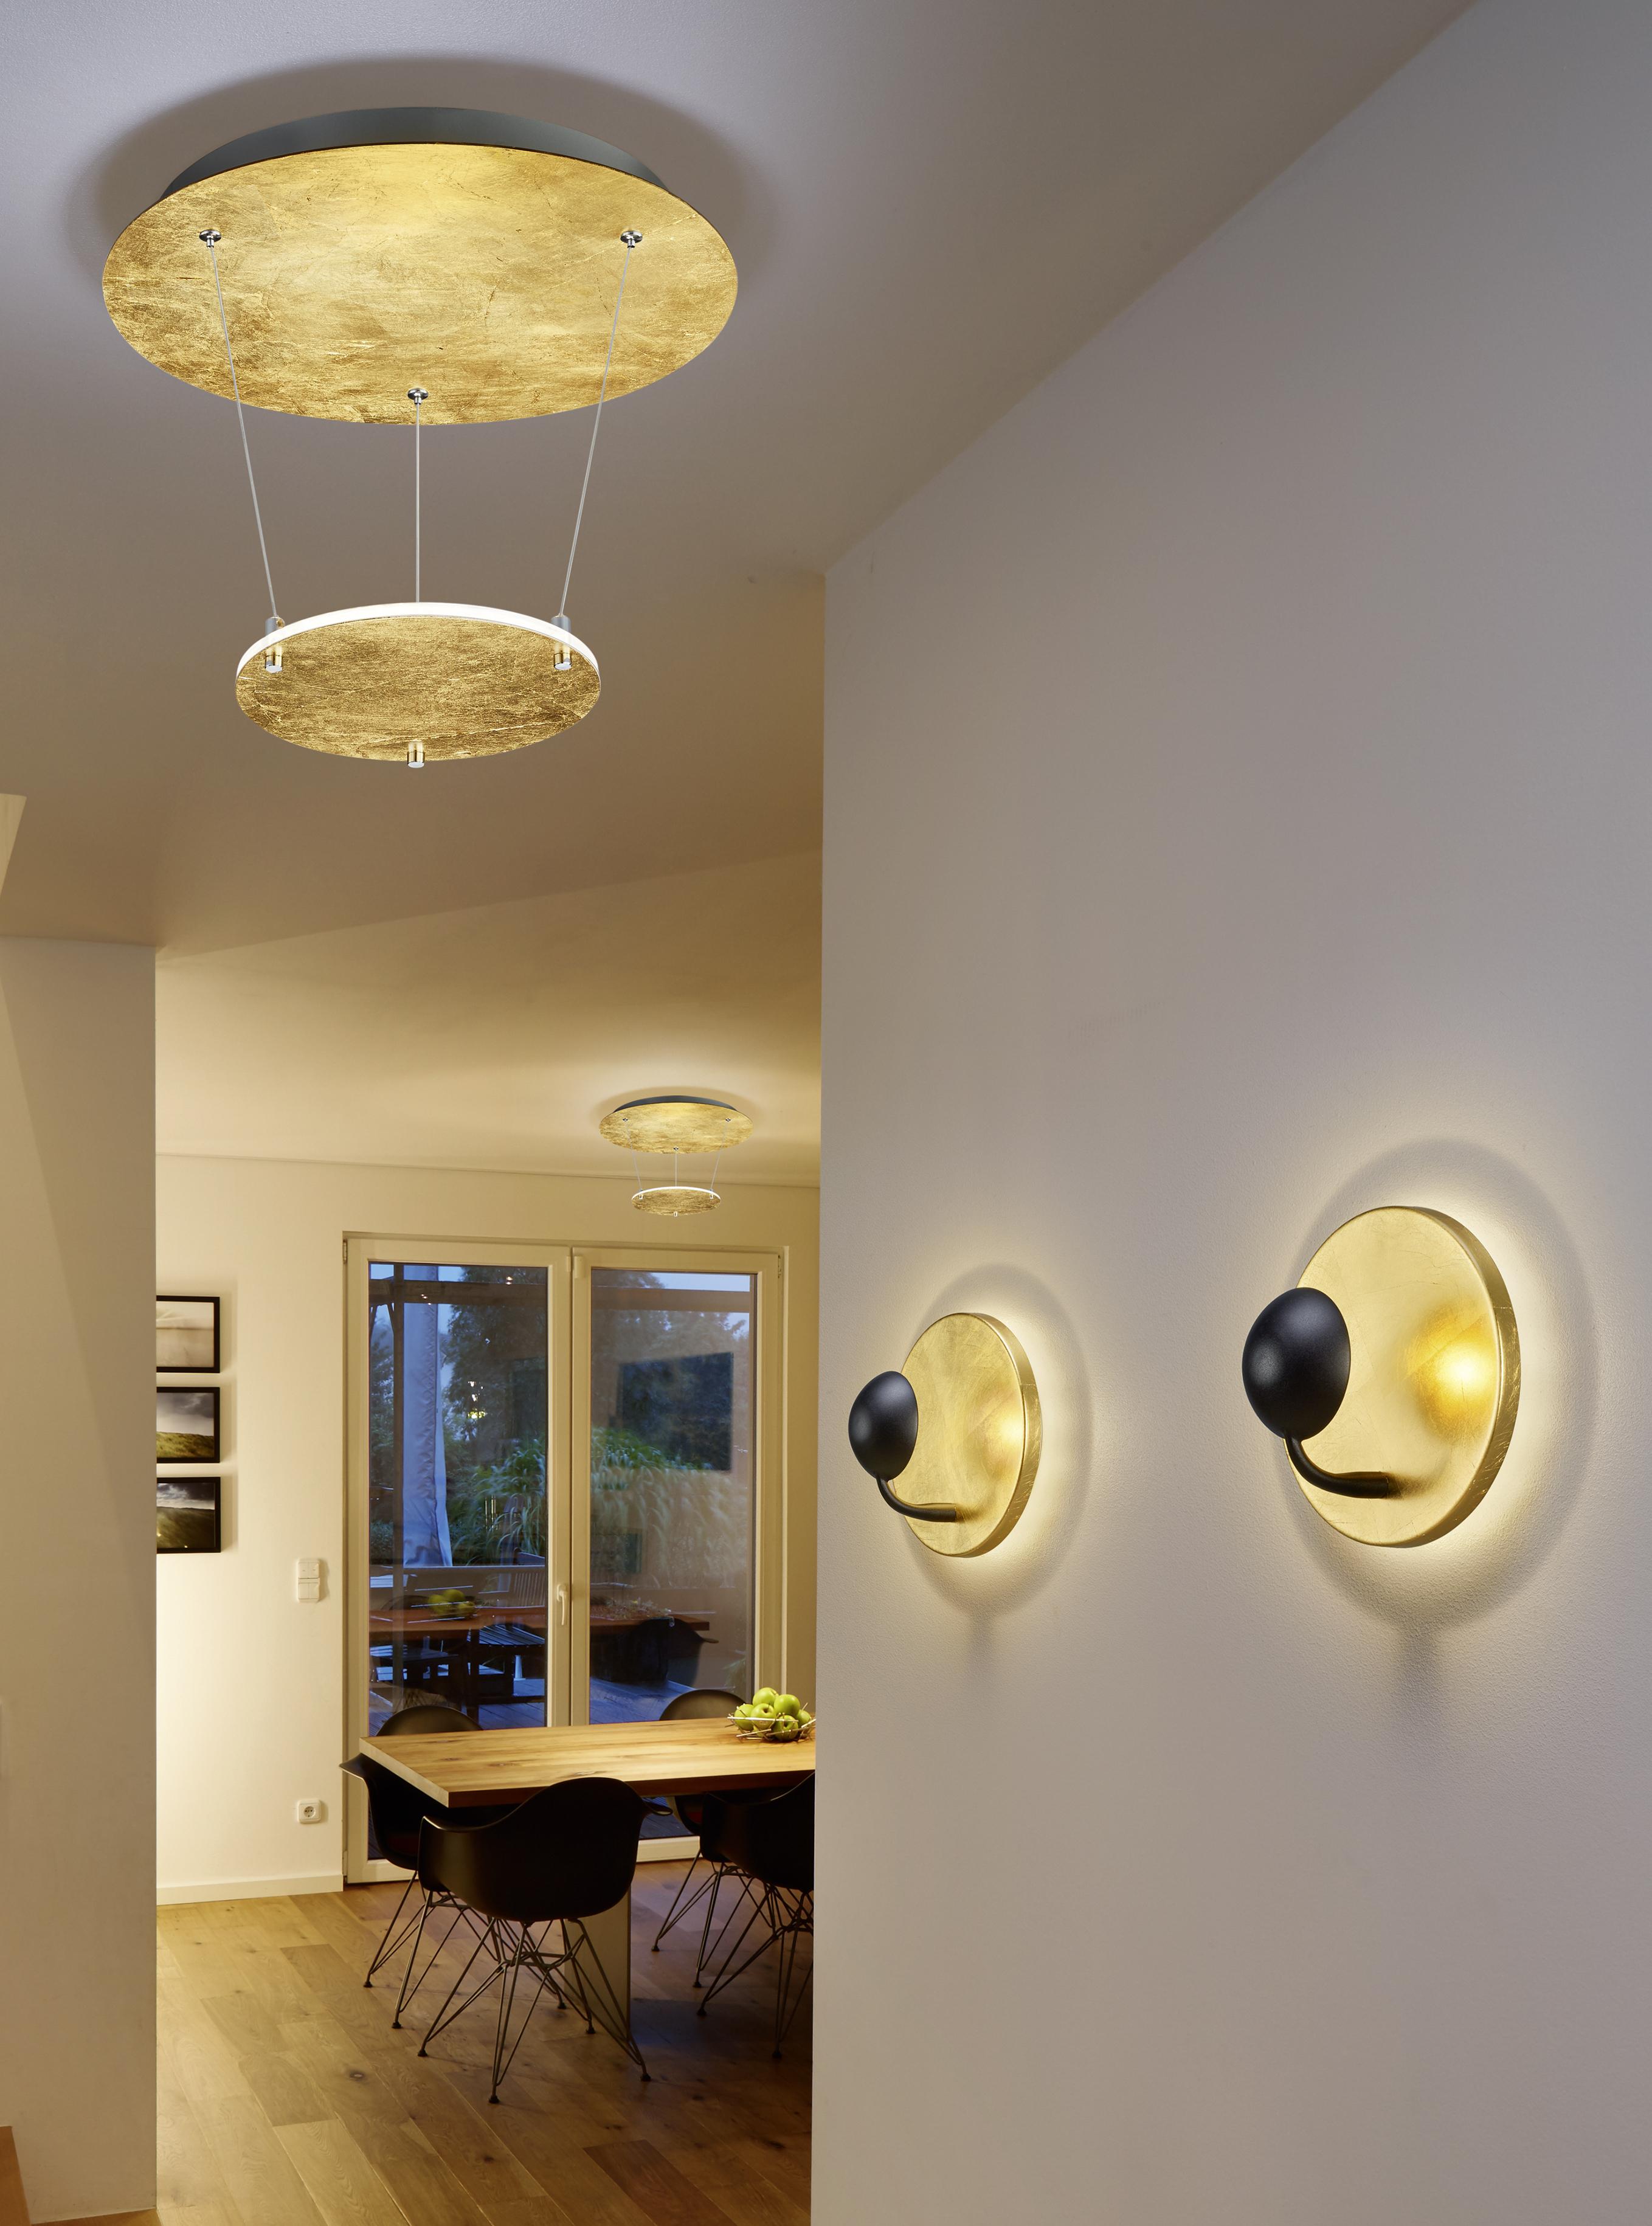 Lampadari moderni le nuove tendenze del 2018 for Lampadari casa classica